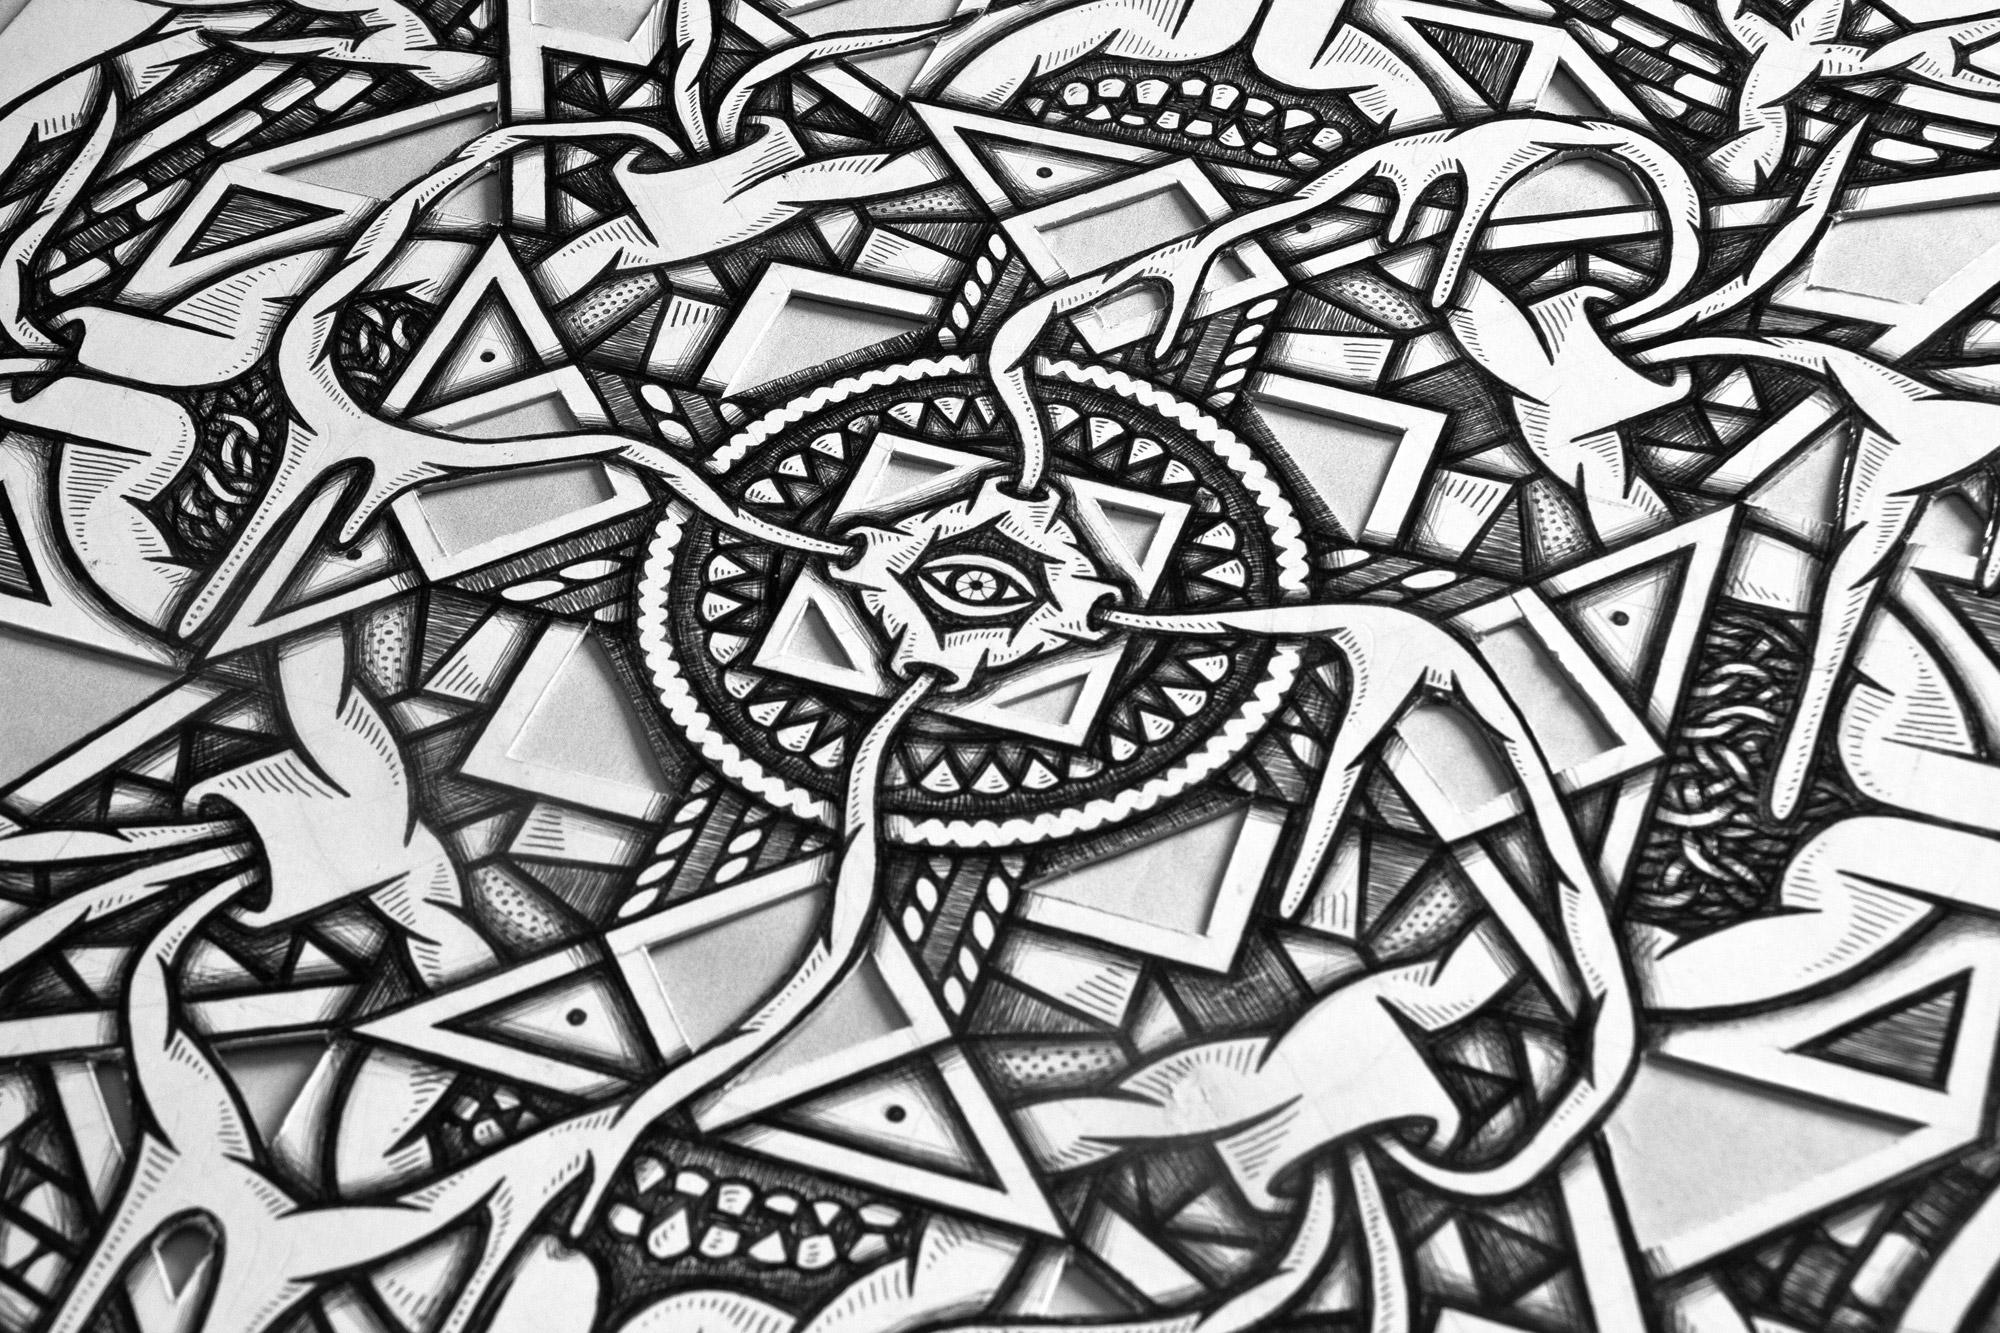 mandala-intero-cutting-pen-detail